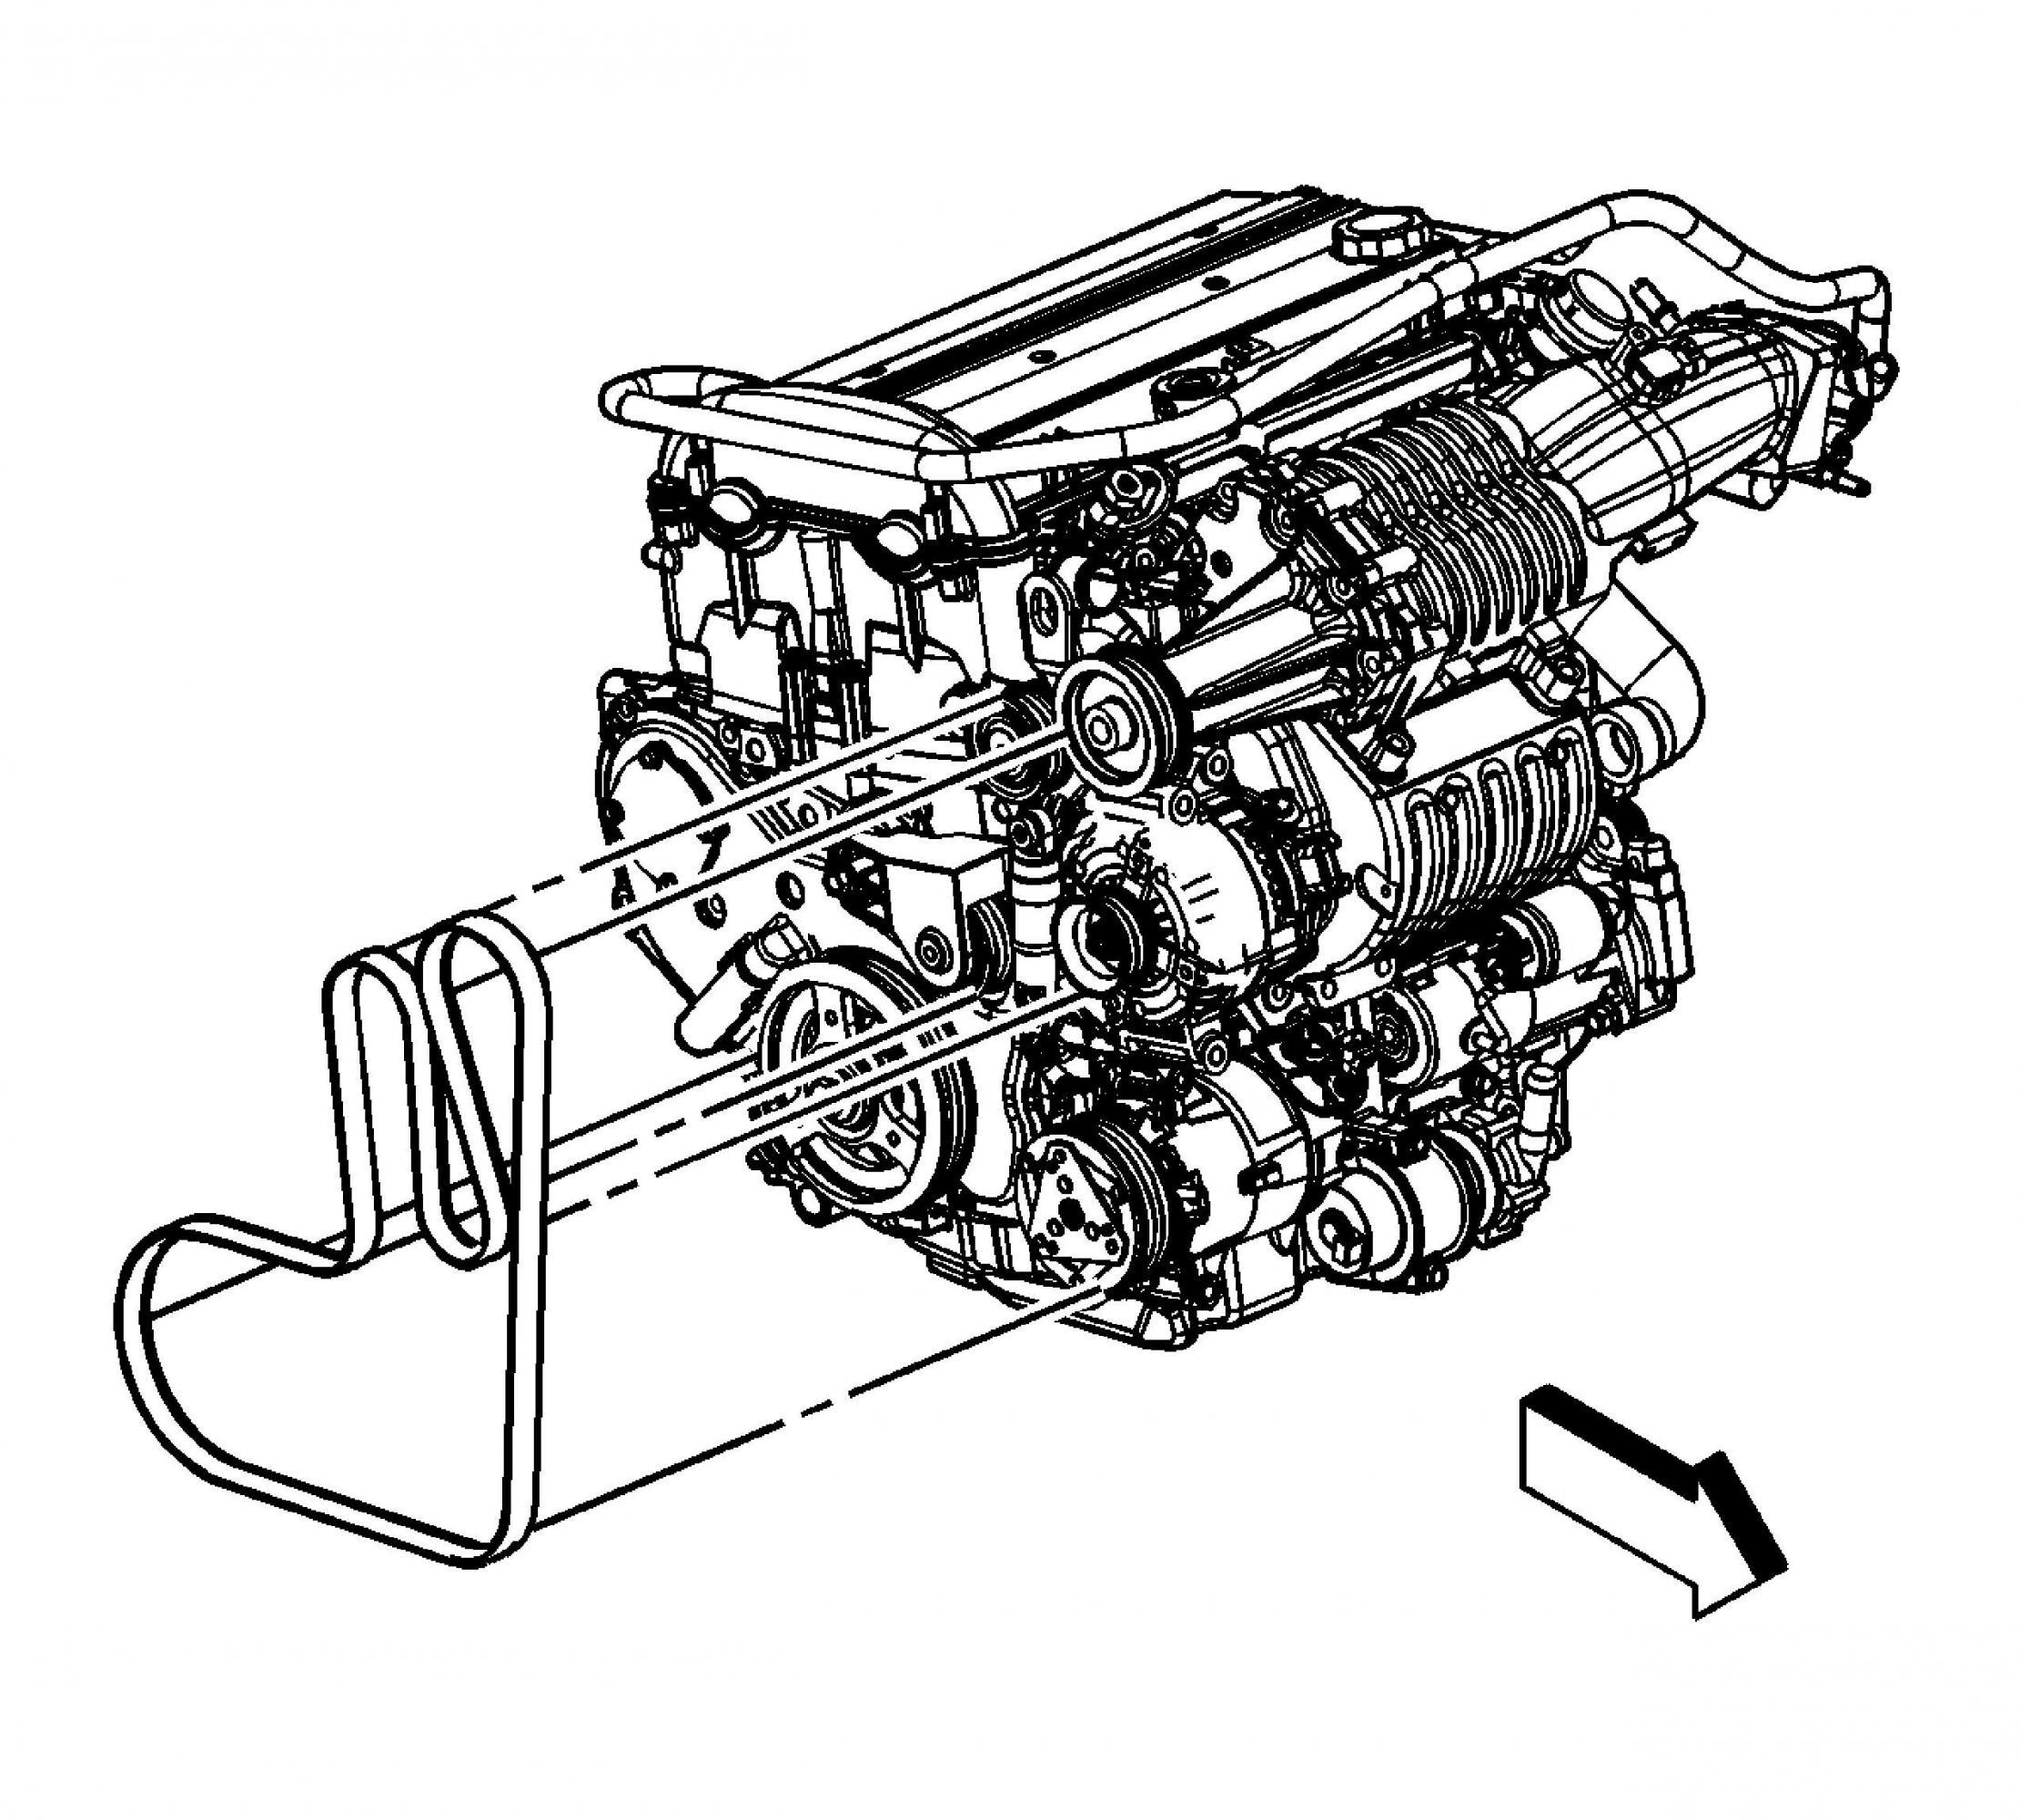 2005 chevy aveo engine diagram